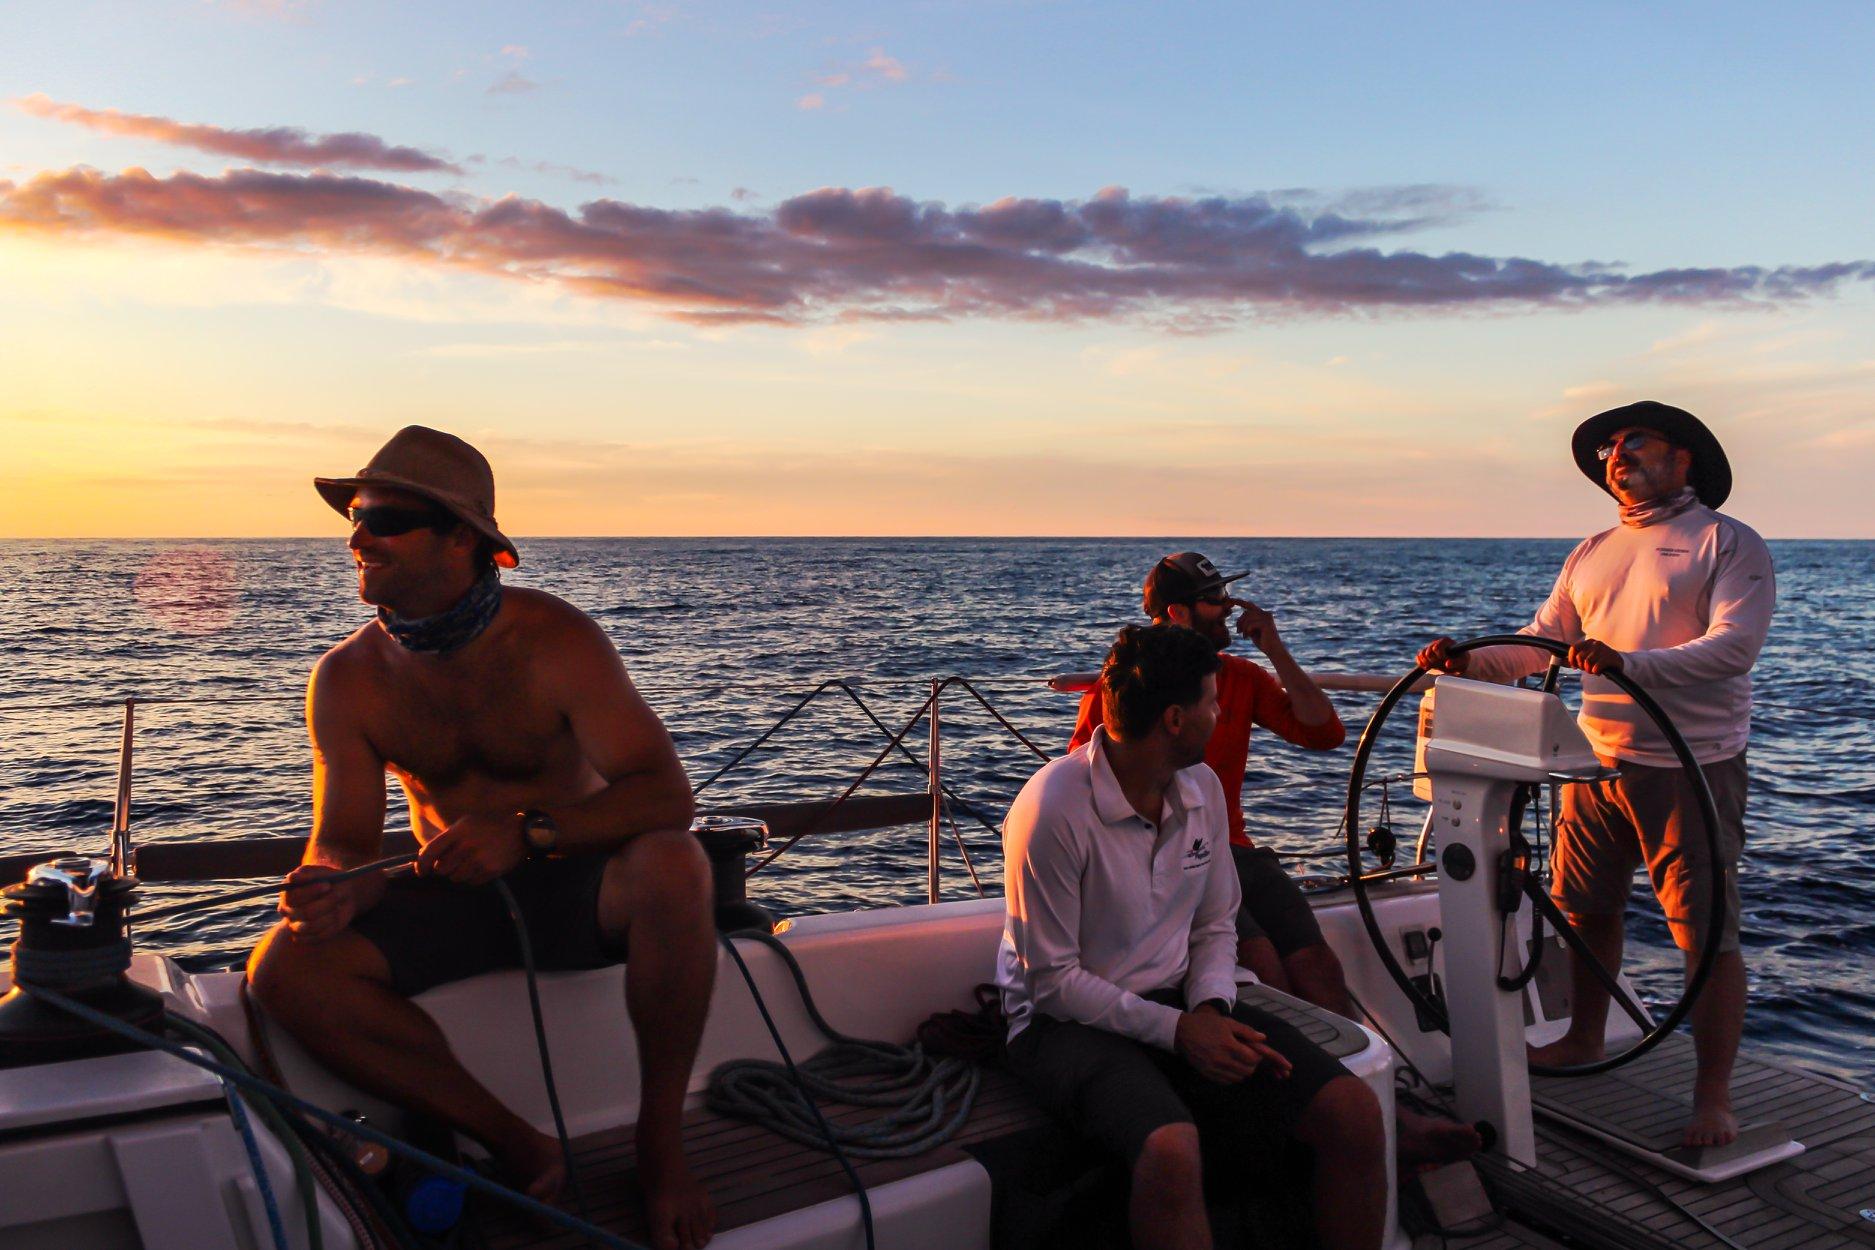 Light winds dominated the 2018 Newport to Bermuda Race. Shown here is the starboard watch on the Marten 49 SUMMER STORM. From the wheel forward: Andrew Berdon, Alden Winder, Ben Cormack, Walker Potts. Josh Reisberg photo.